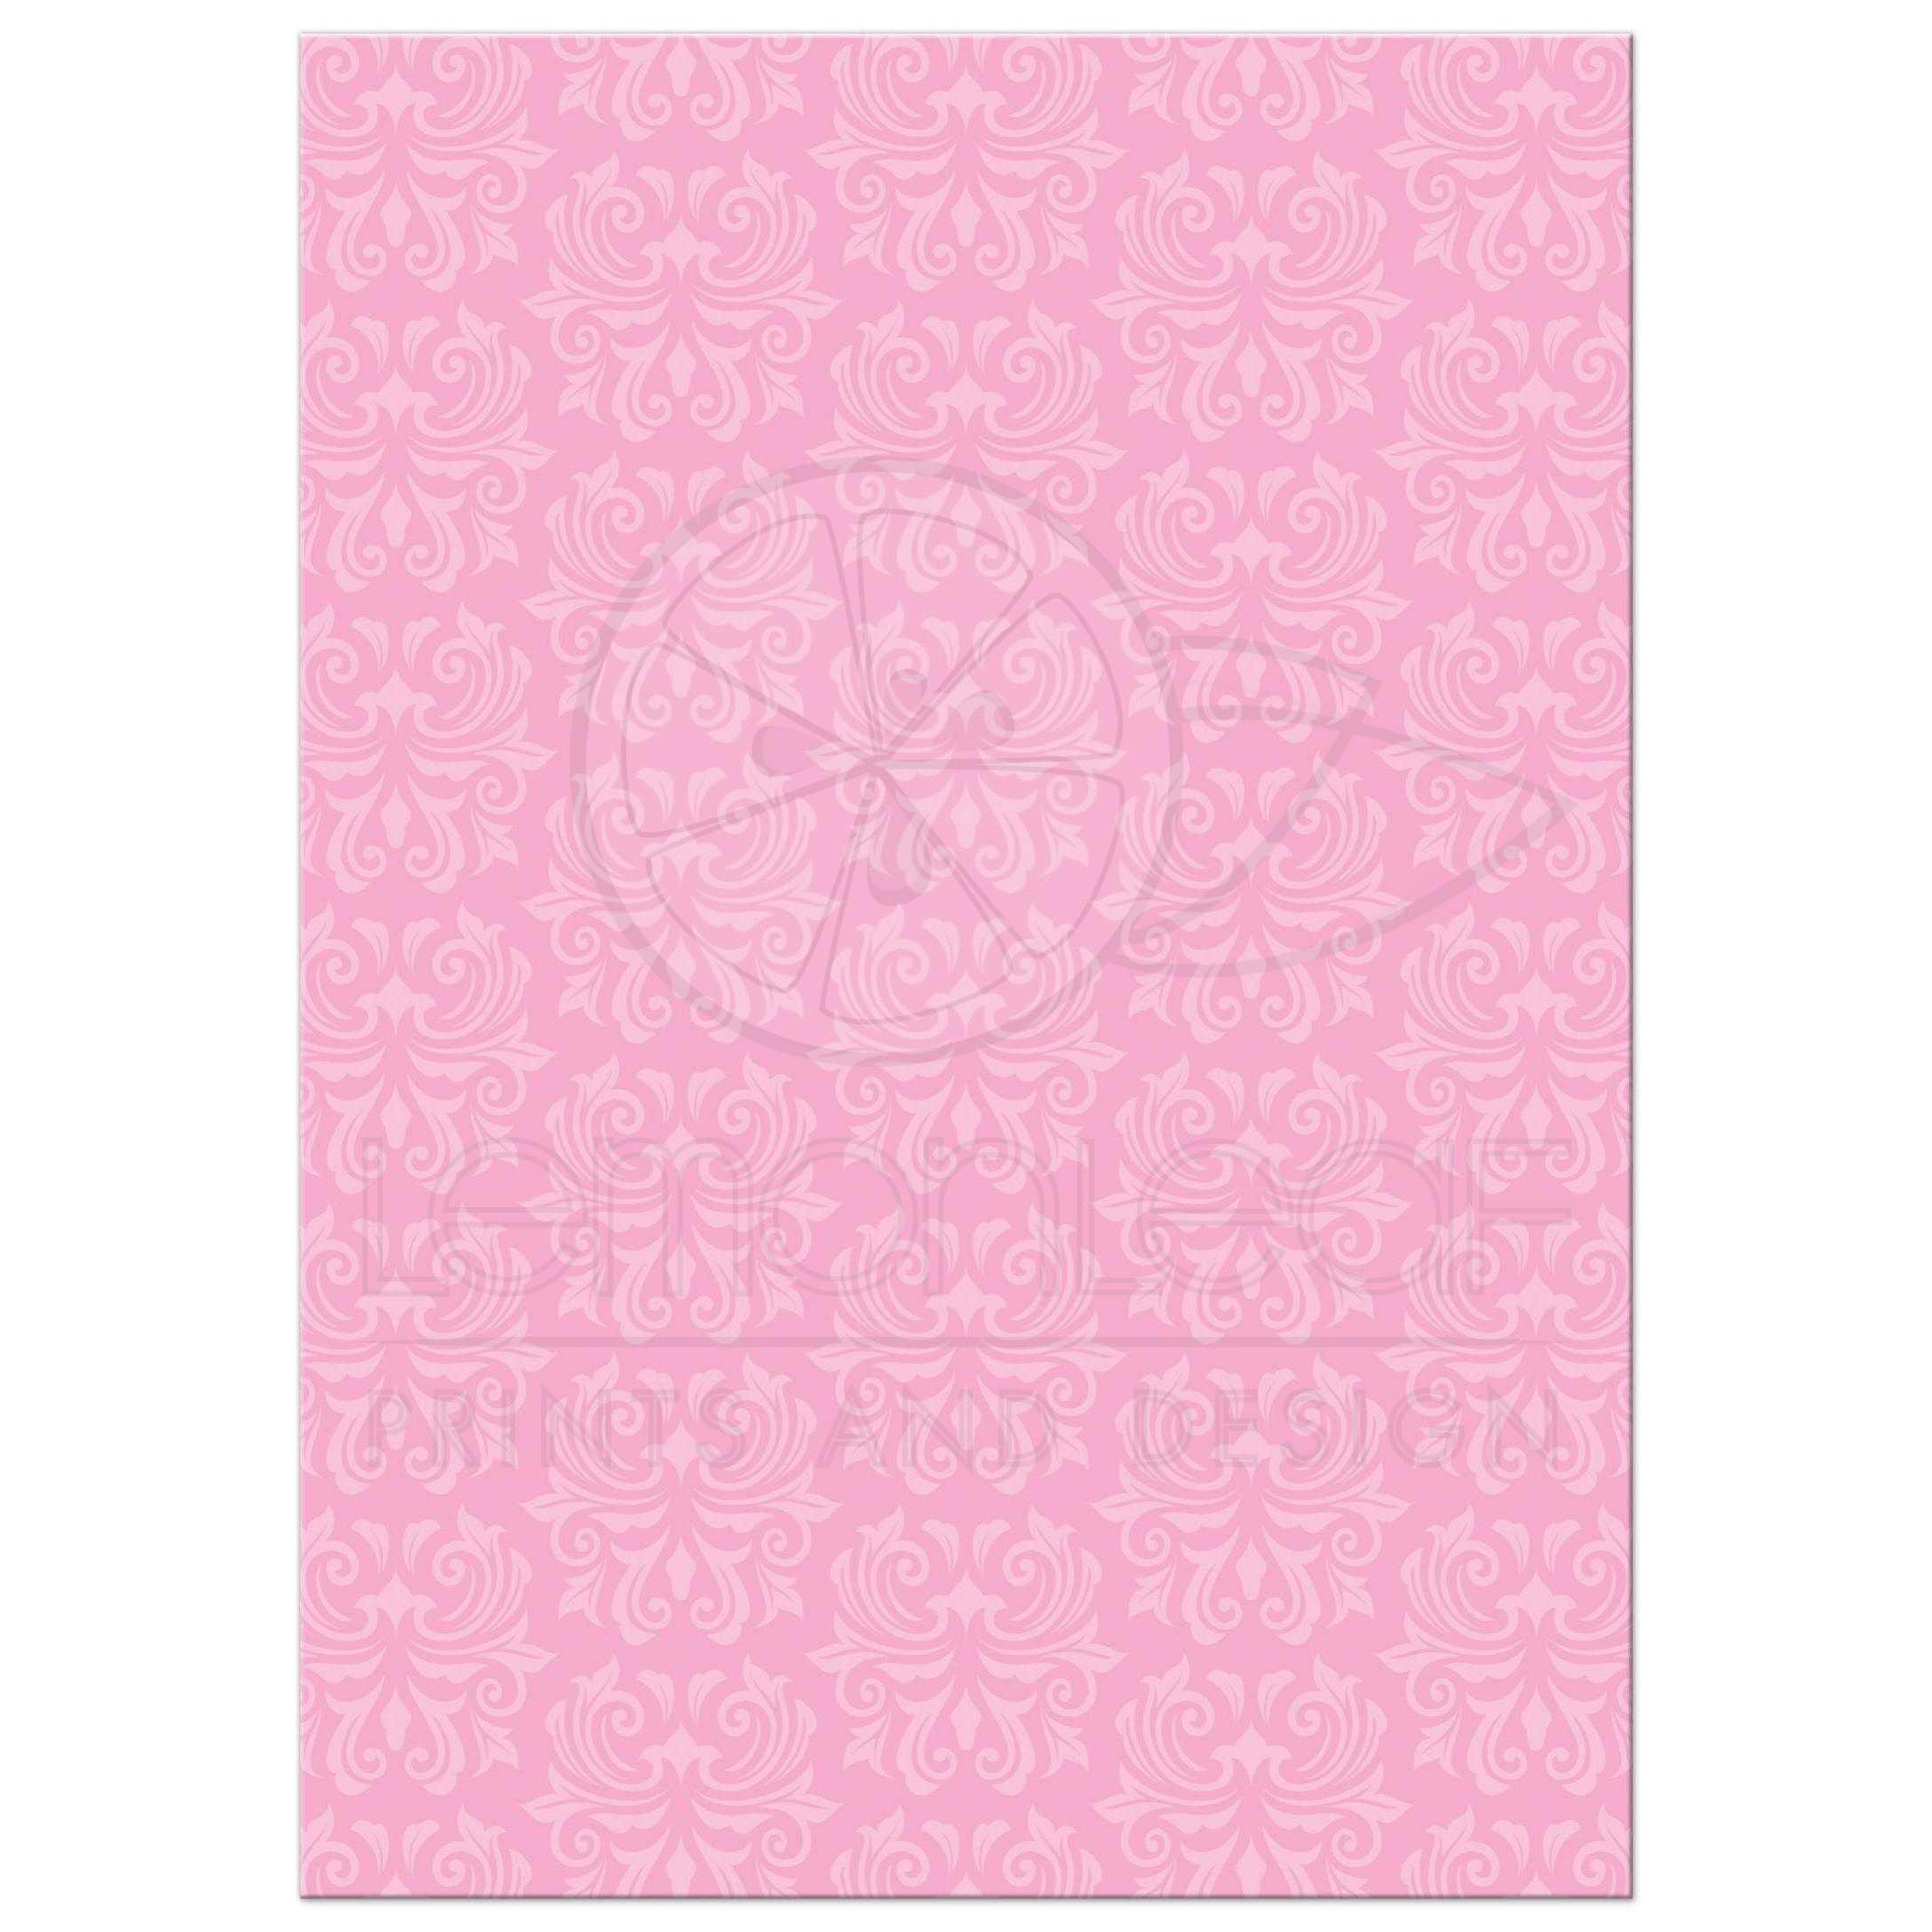 Ornate, pink damask borders baptism/christening invitation ...